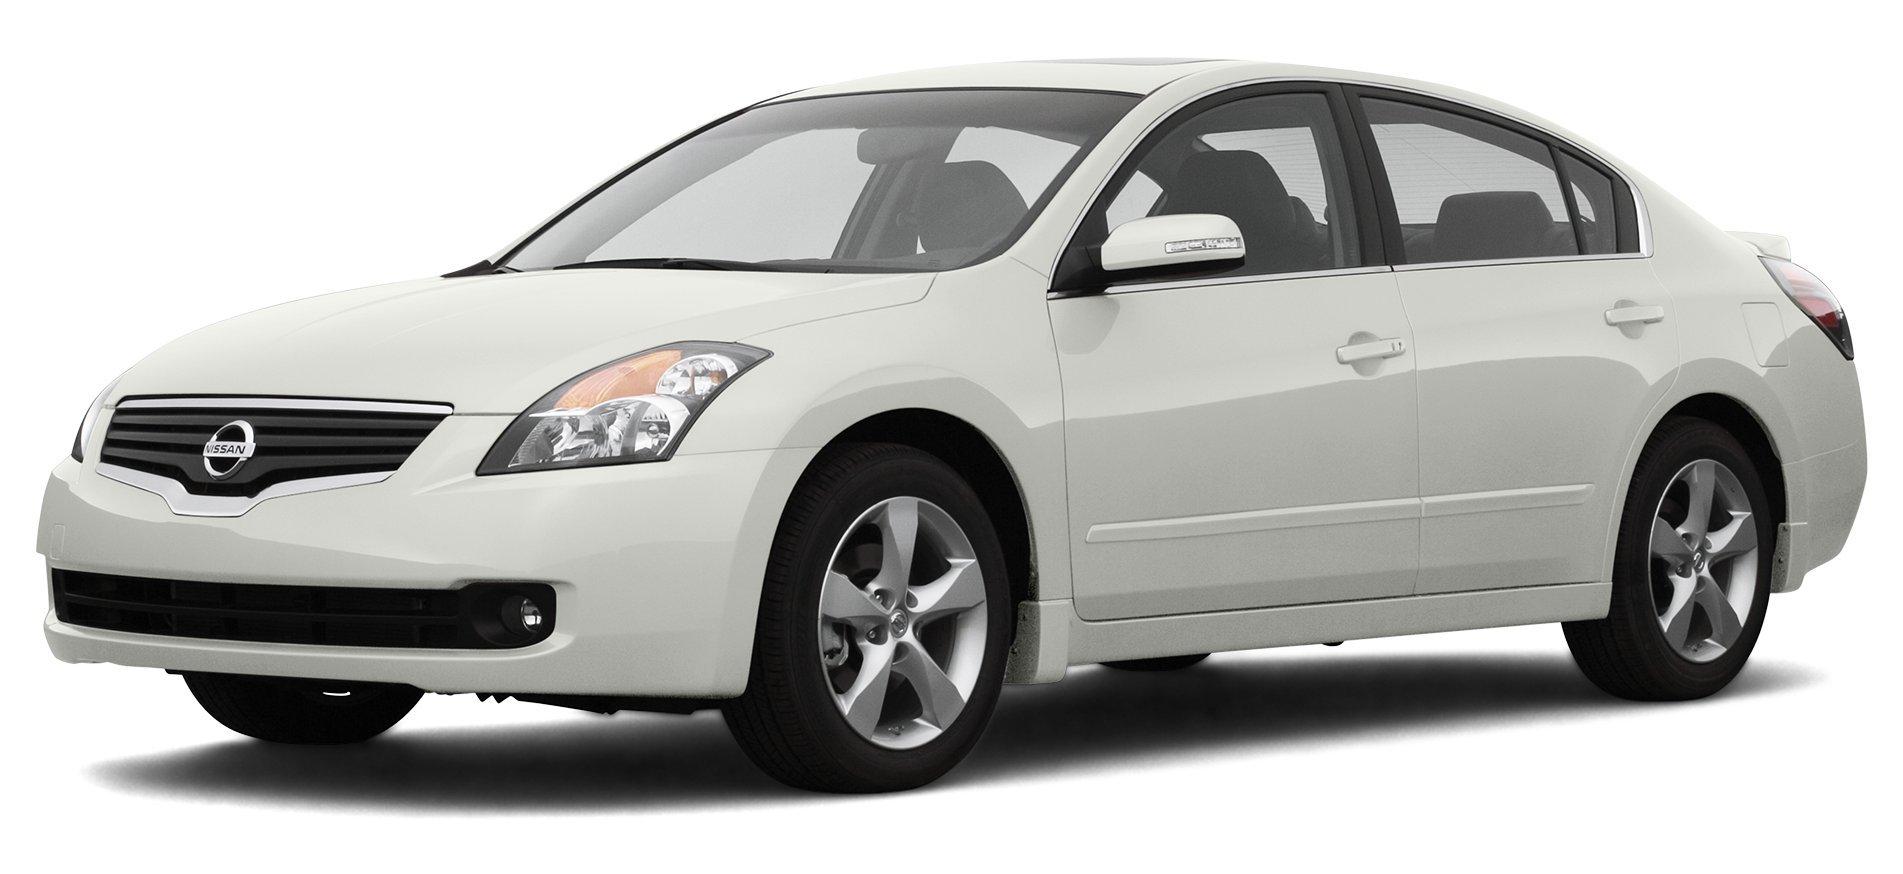 Great ... Wheel Drive, 2008 Nissan Altima 3.5 SL, 4 Door Sedan V6 CVT